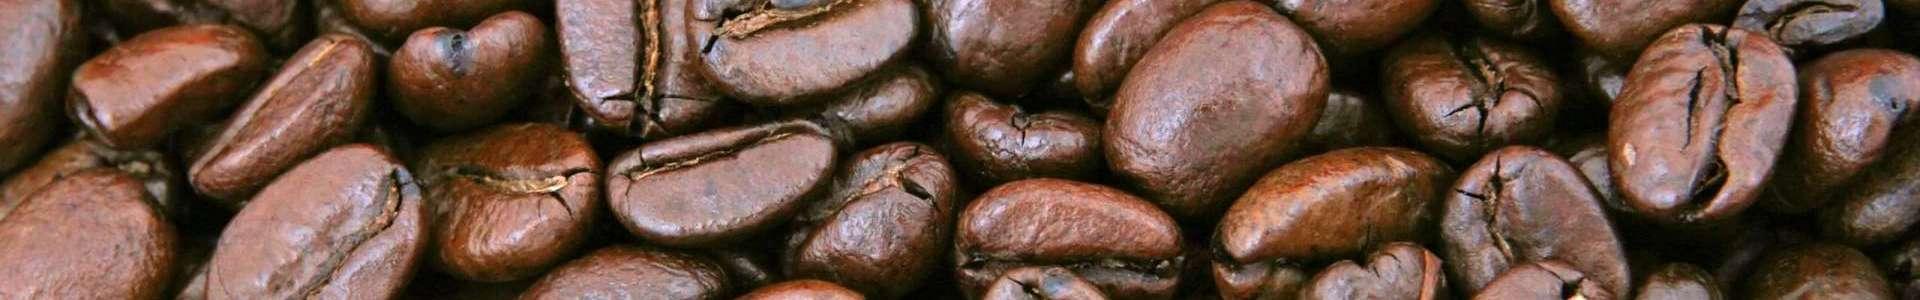 Coffee Tax